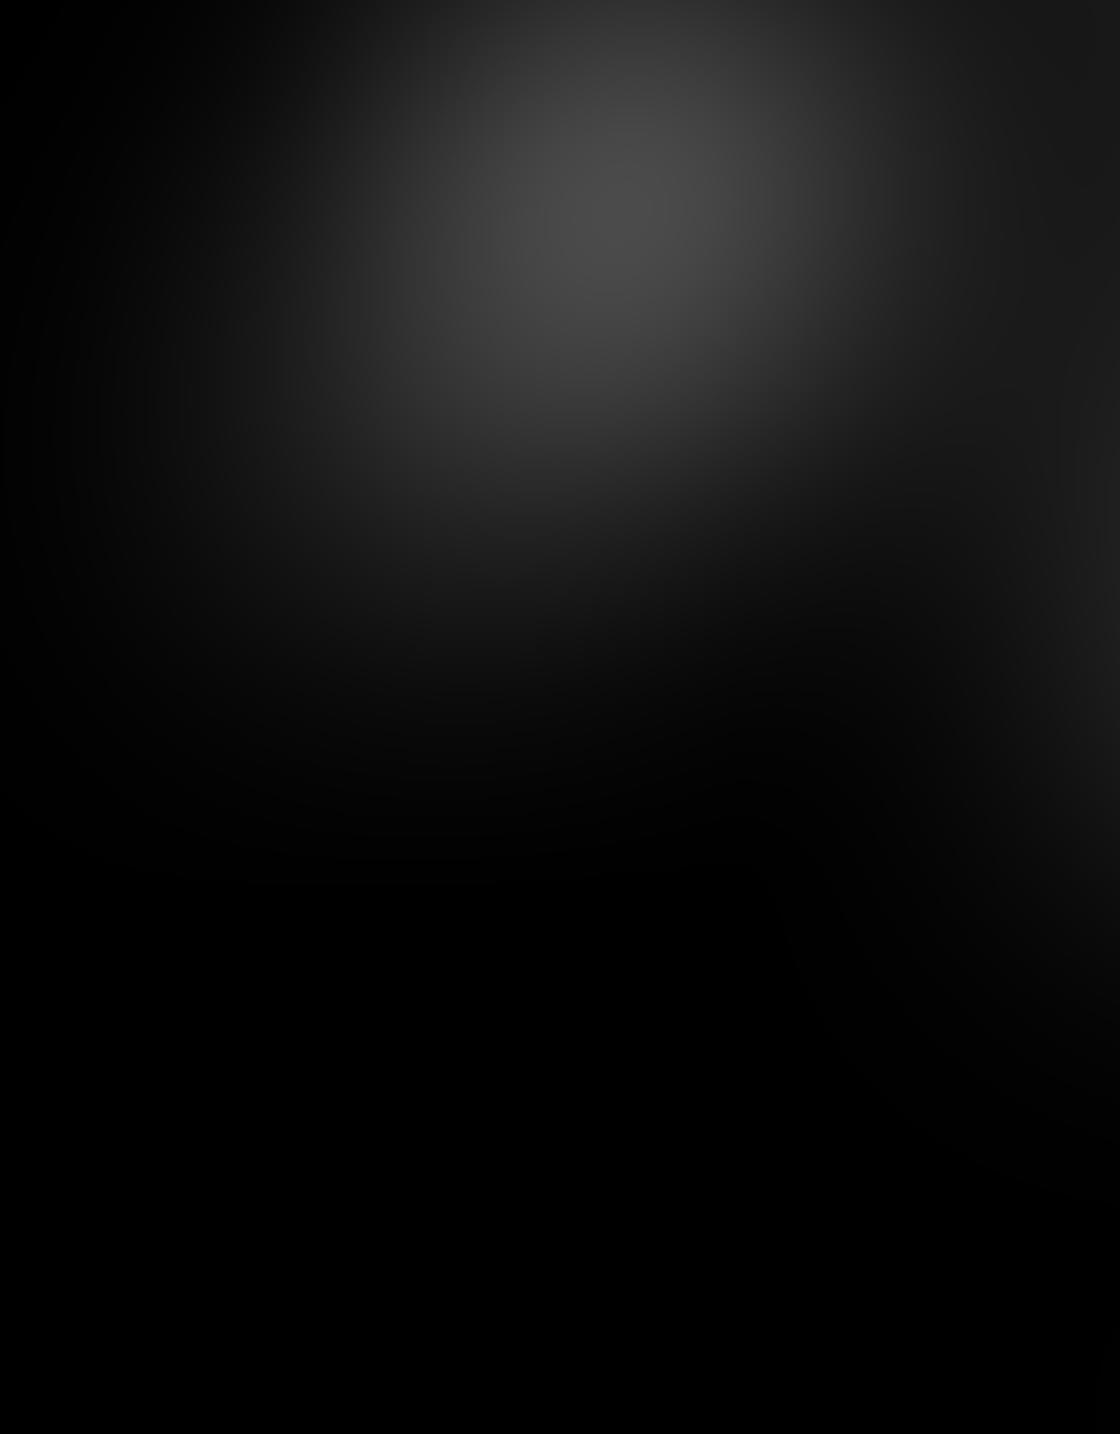 iPhone Photo Black White 12